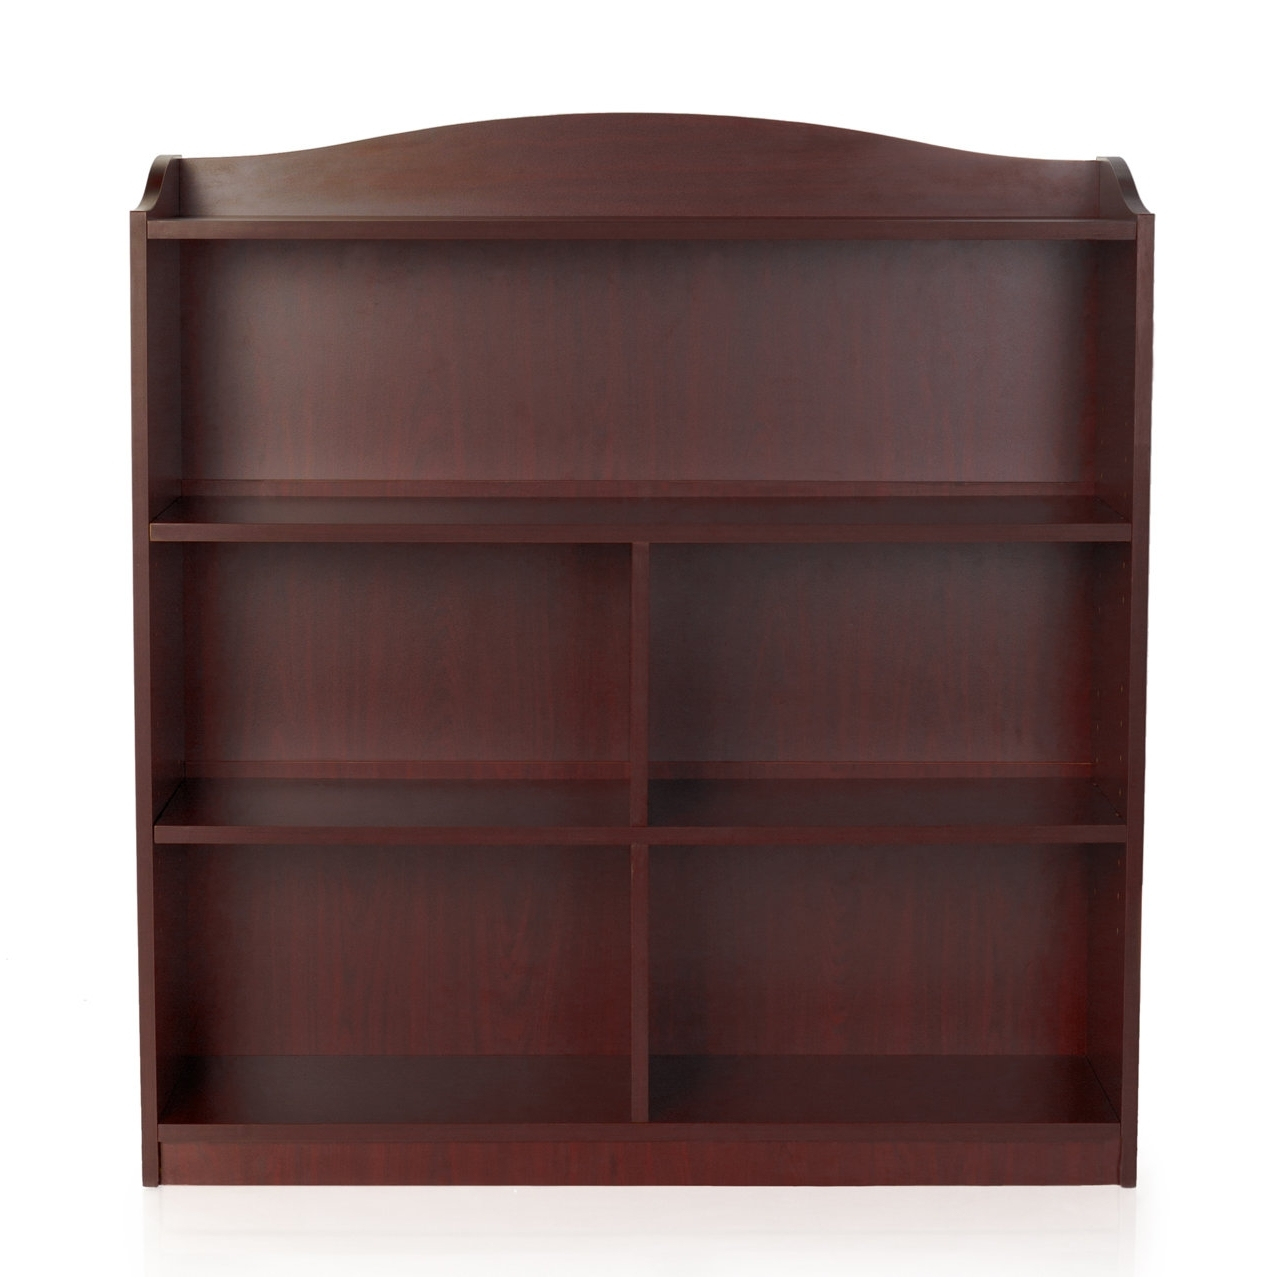 "Guidecraft 4 Shelf 36"" Bookcase & Reviews (View 7 of 15)"